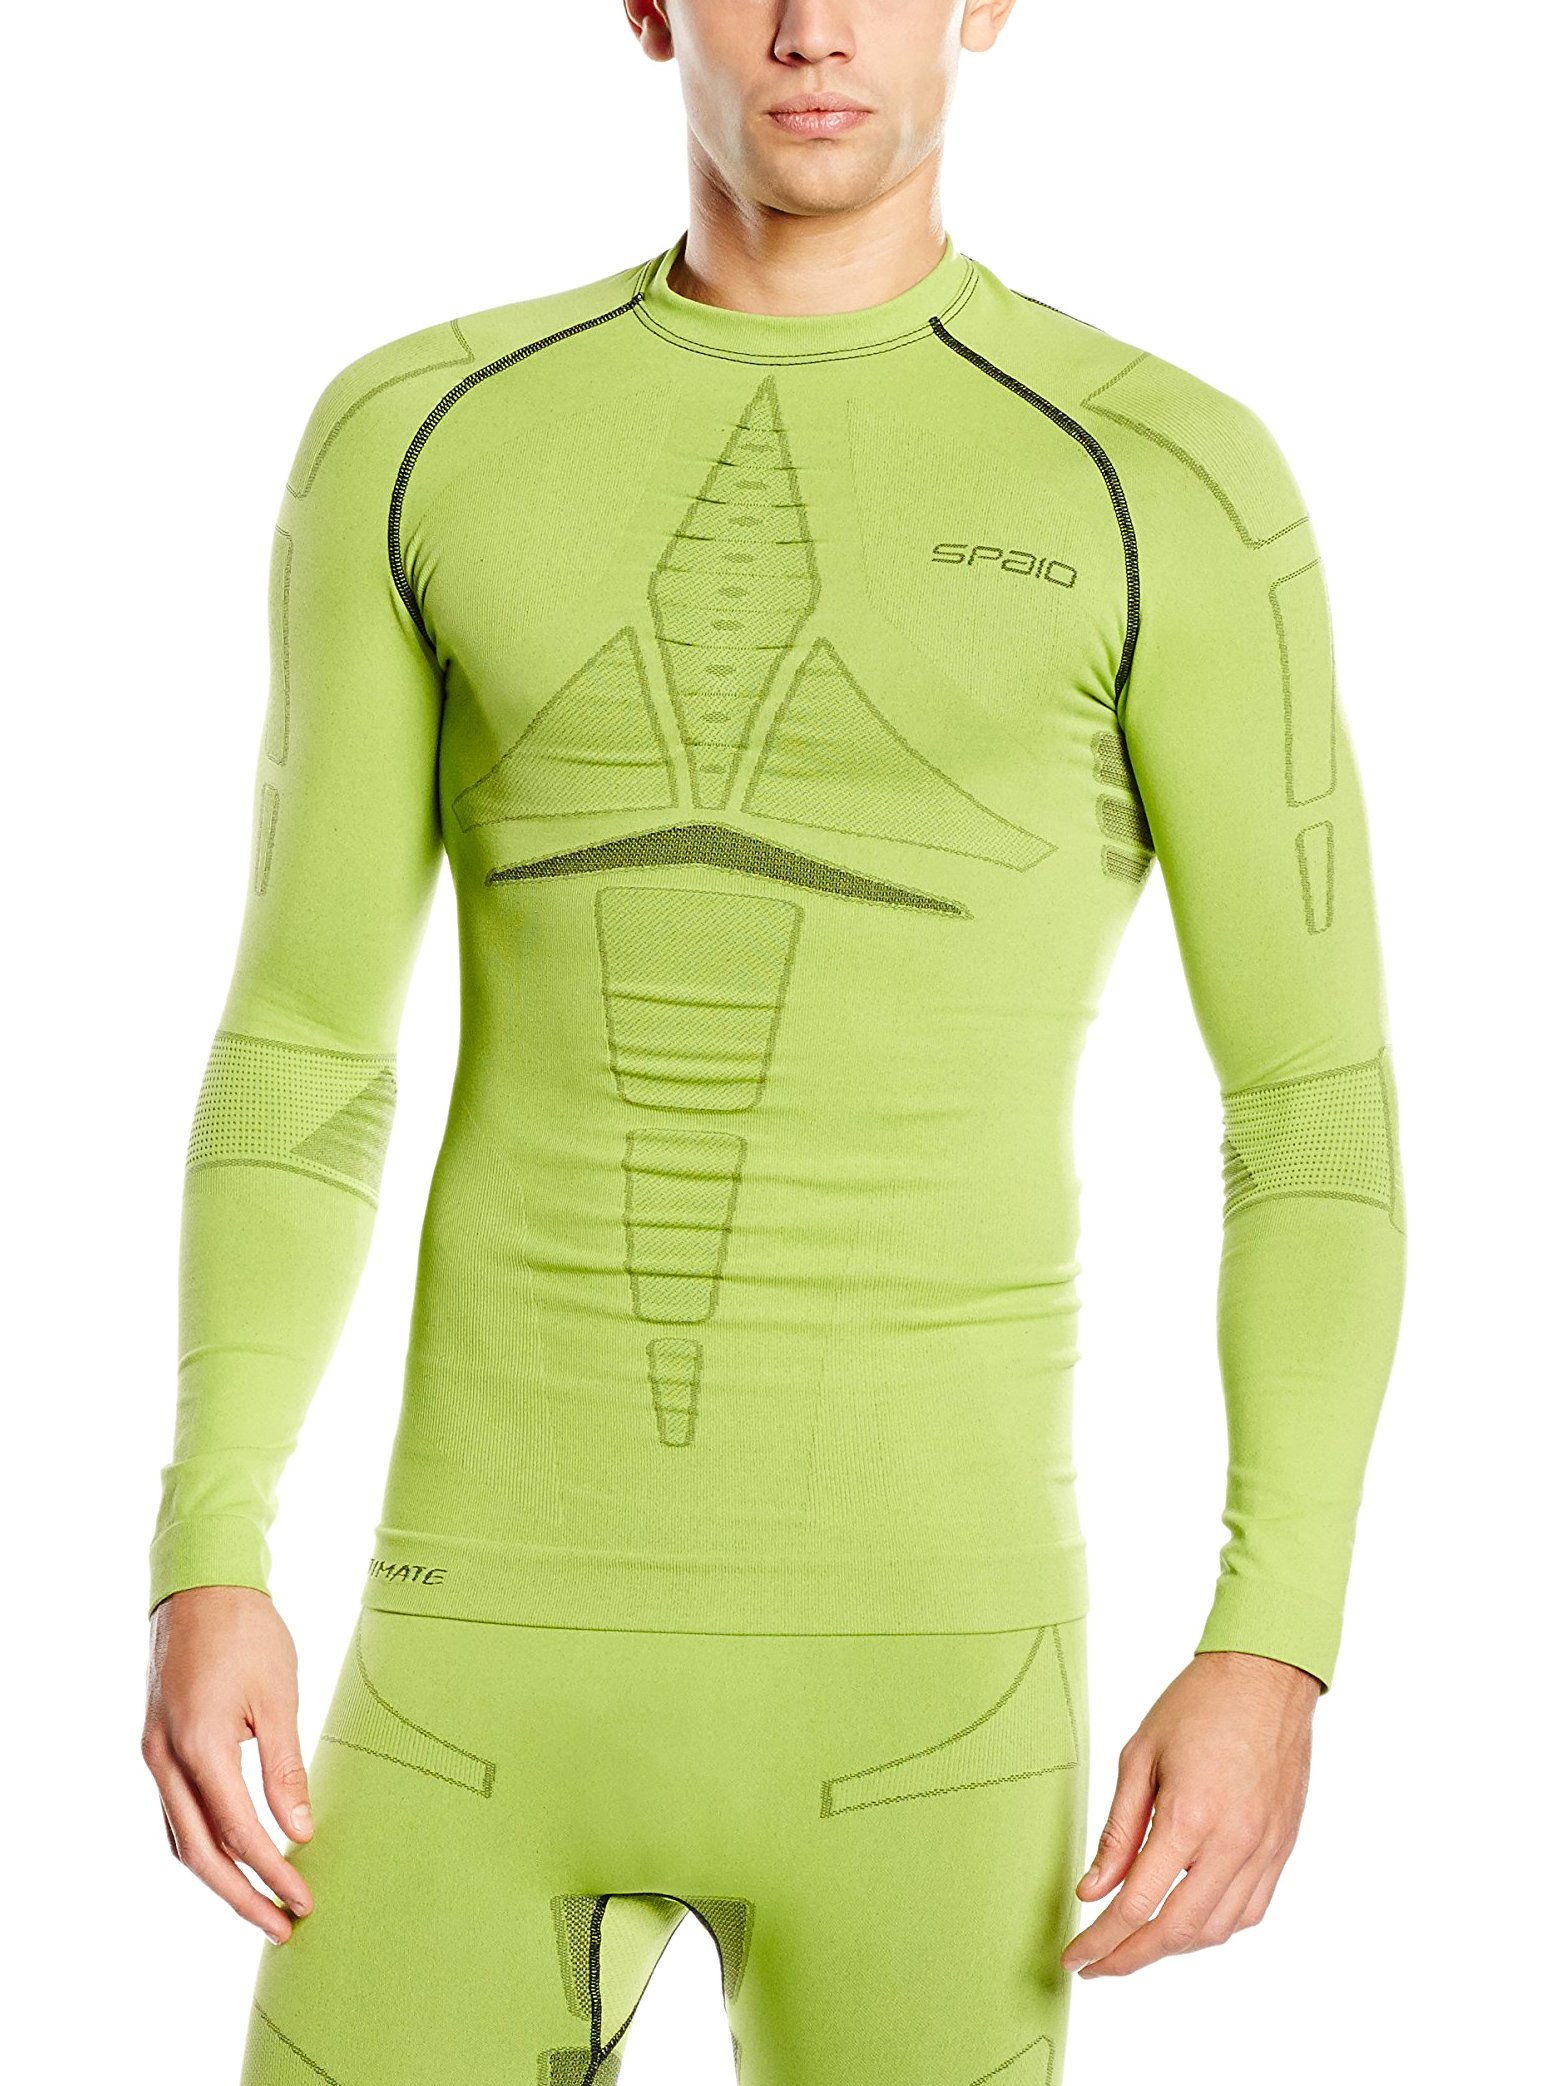 SPAIO ® Herren Shirt Ultimate, Lime, XXL, 5901282032961